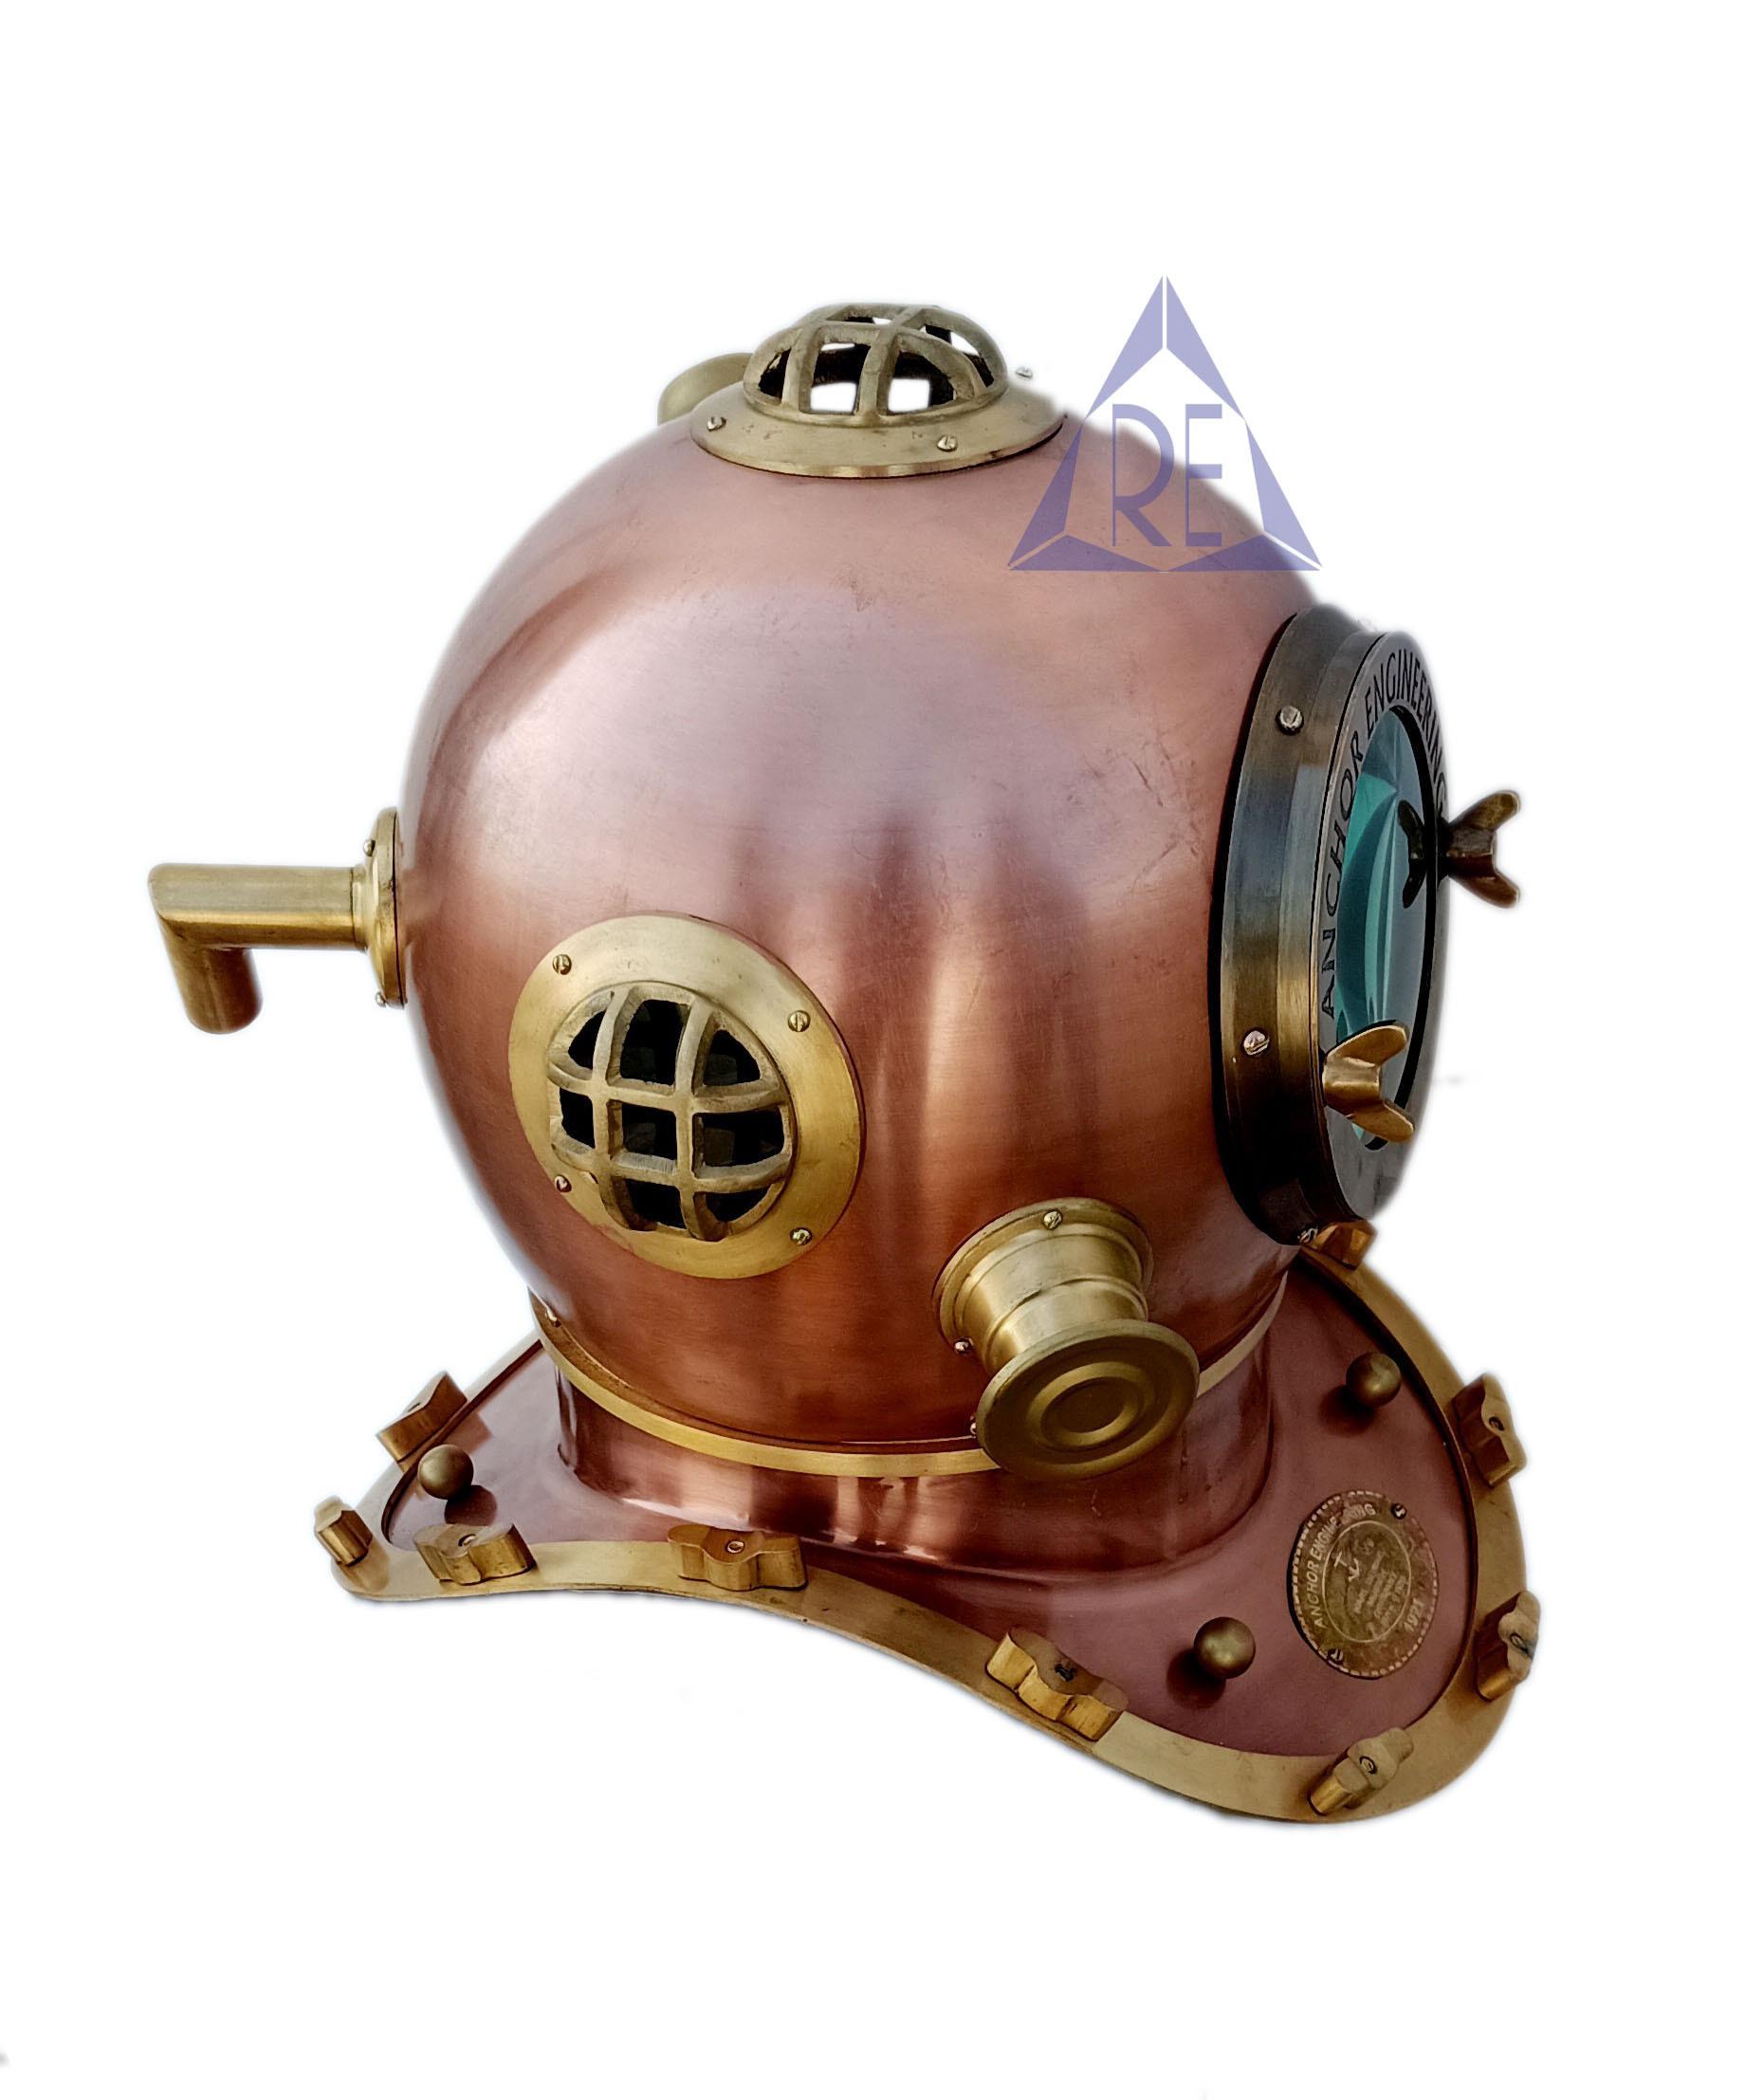 Anchor Engineering Home Decor Mark IV Diving/Divers Helmet